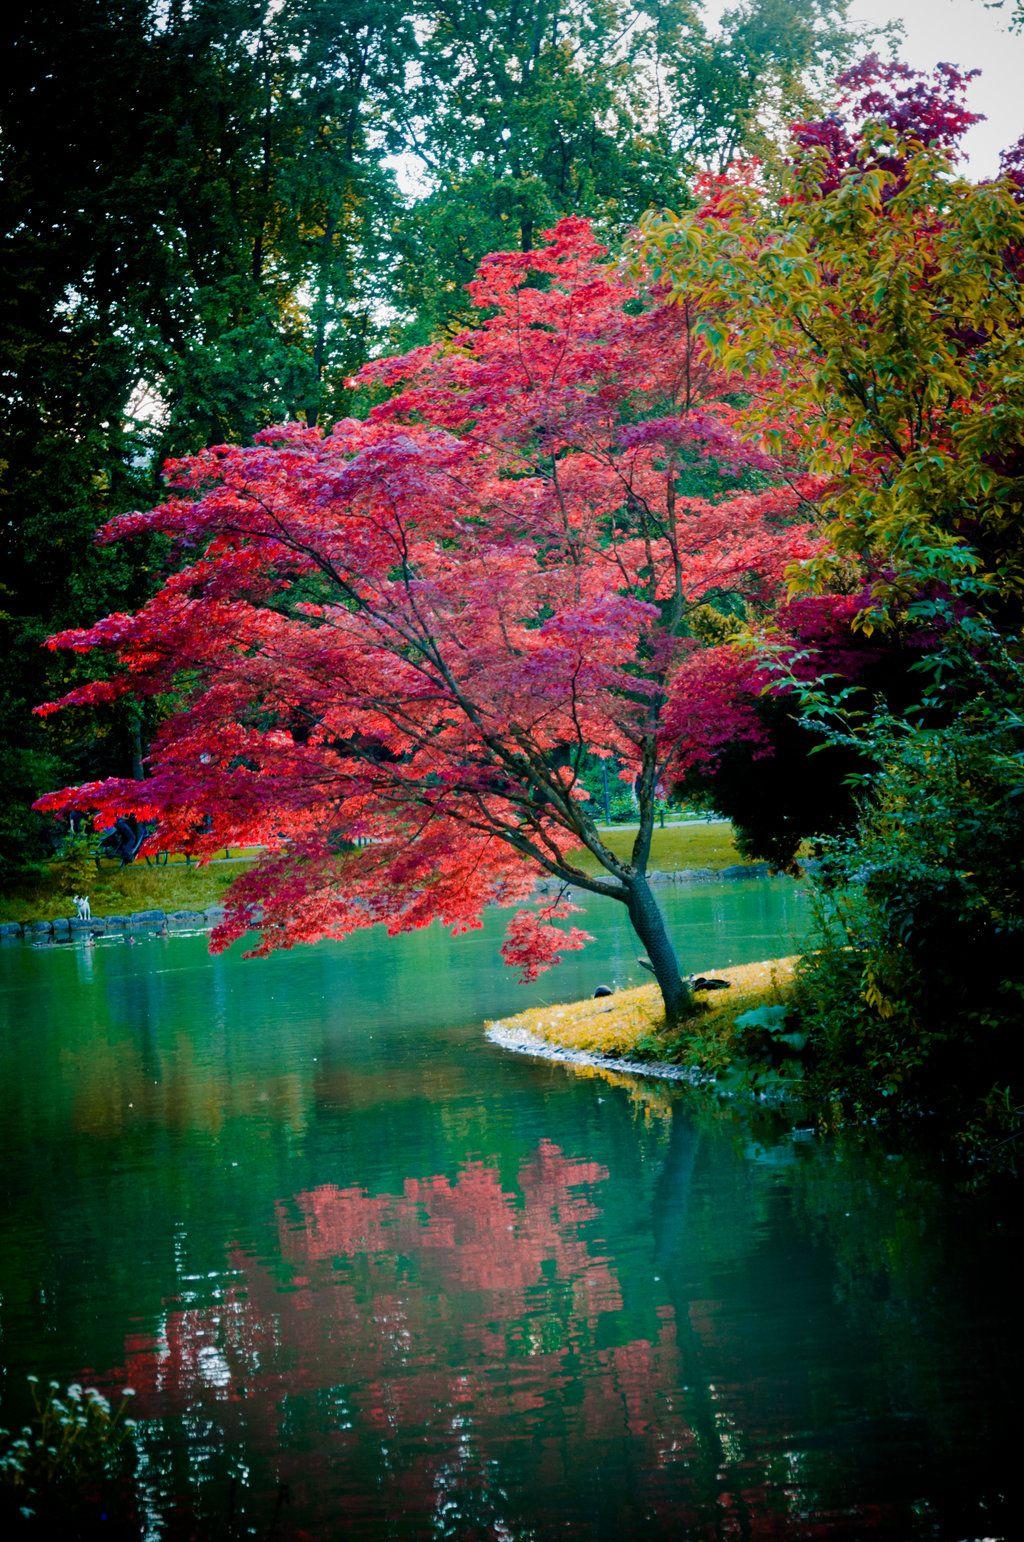 Trees│Árboles - #Trees Más | Bosques | Pinterest | Red tree, Munich ...